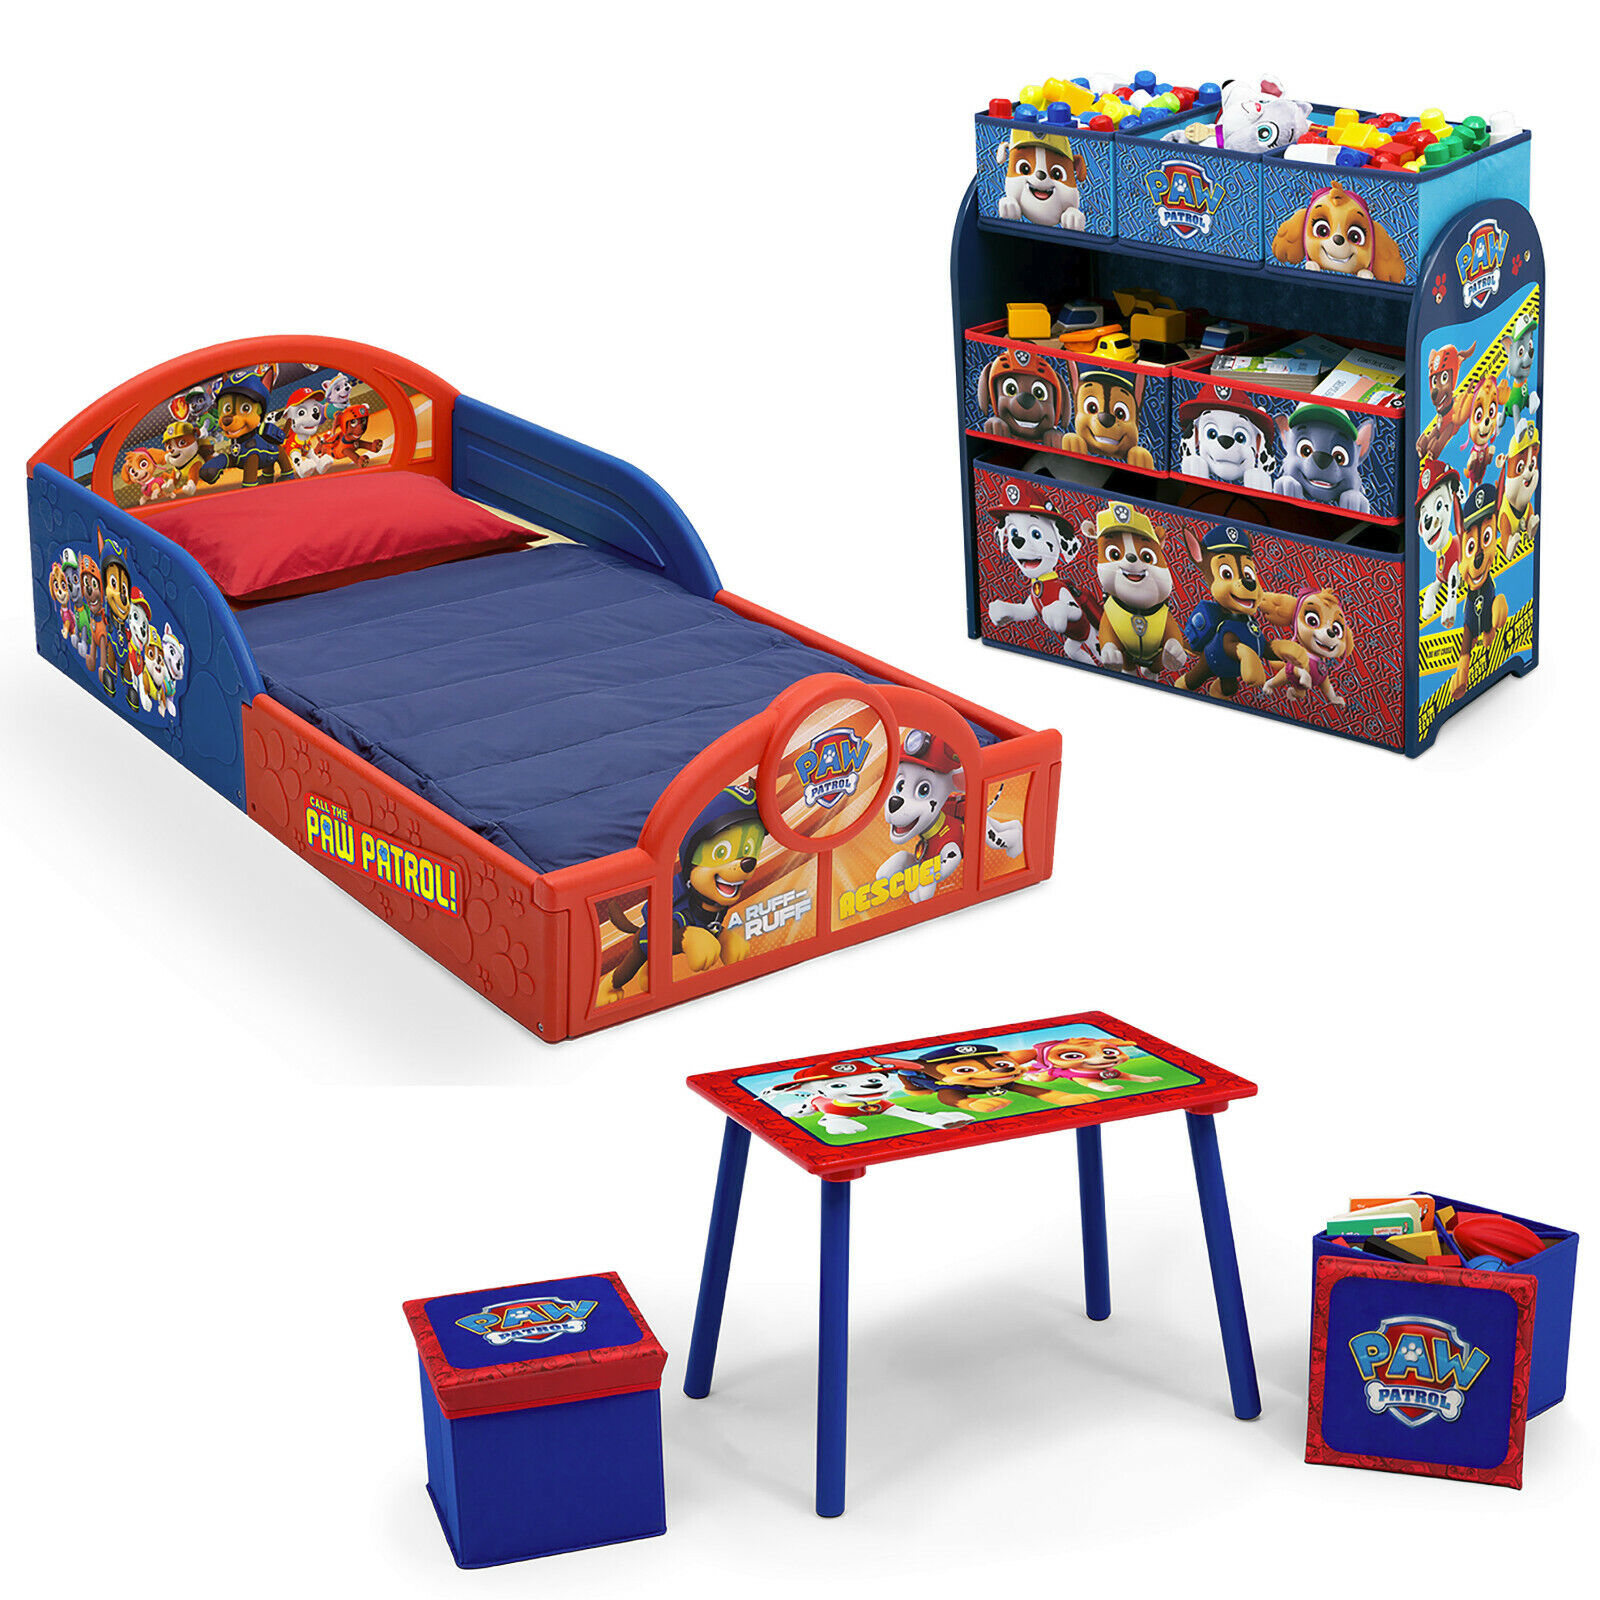 Nick Jr. PAW Patrol 5-Piece Toddler Bedroom Set,Toddler Bed,